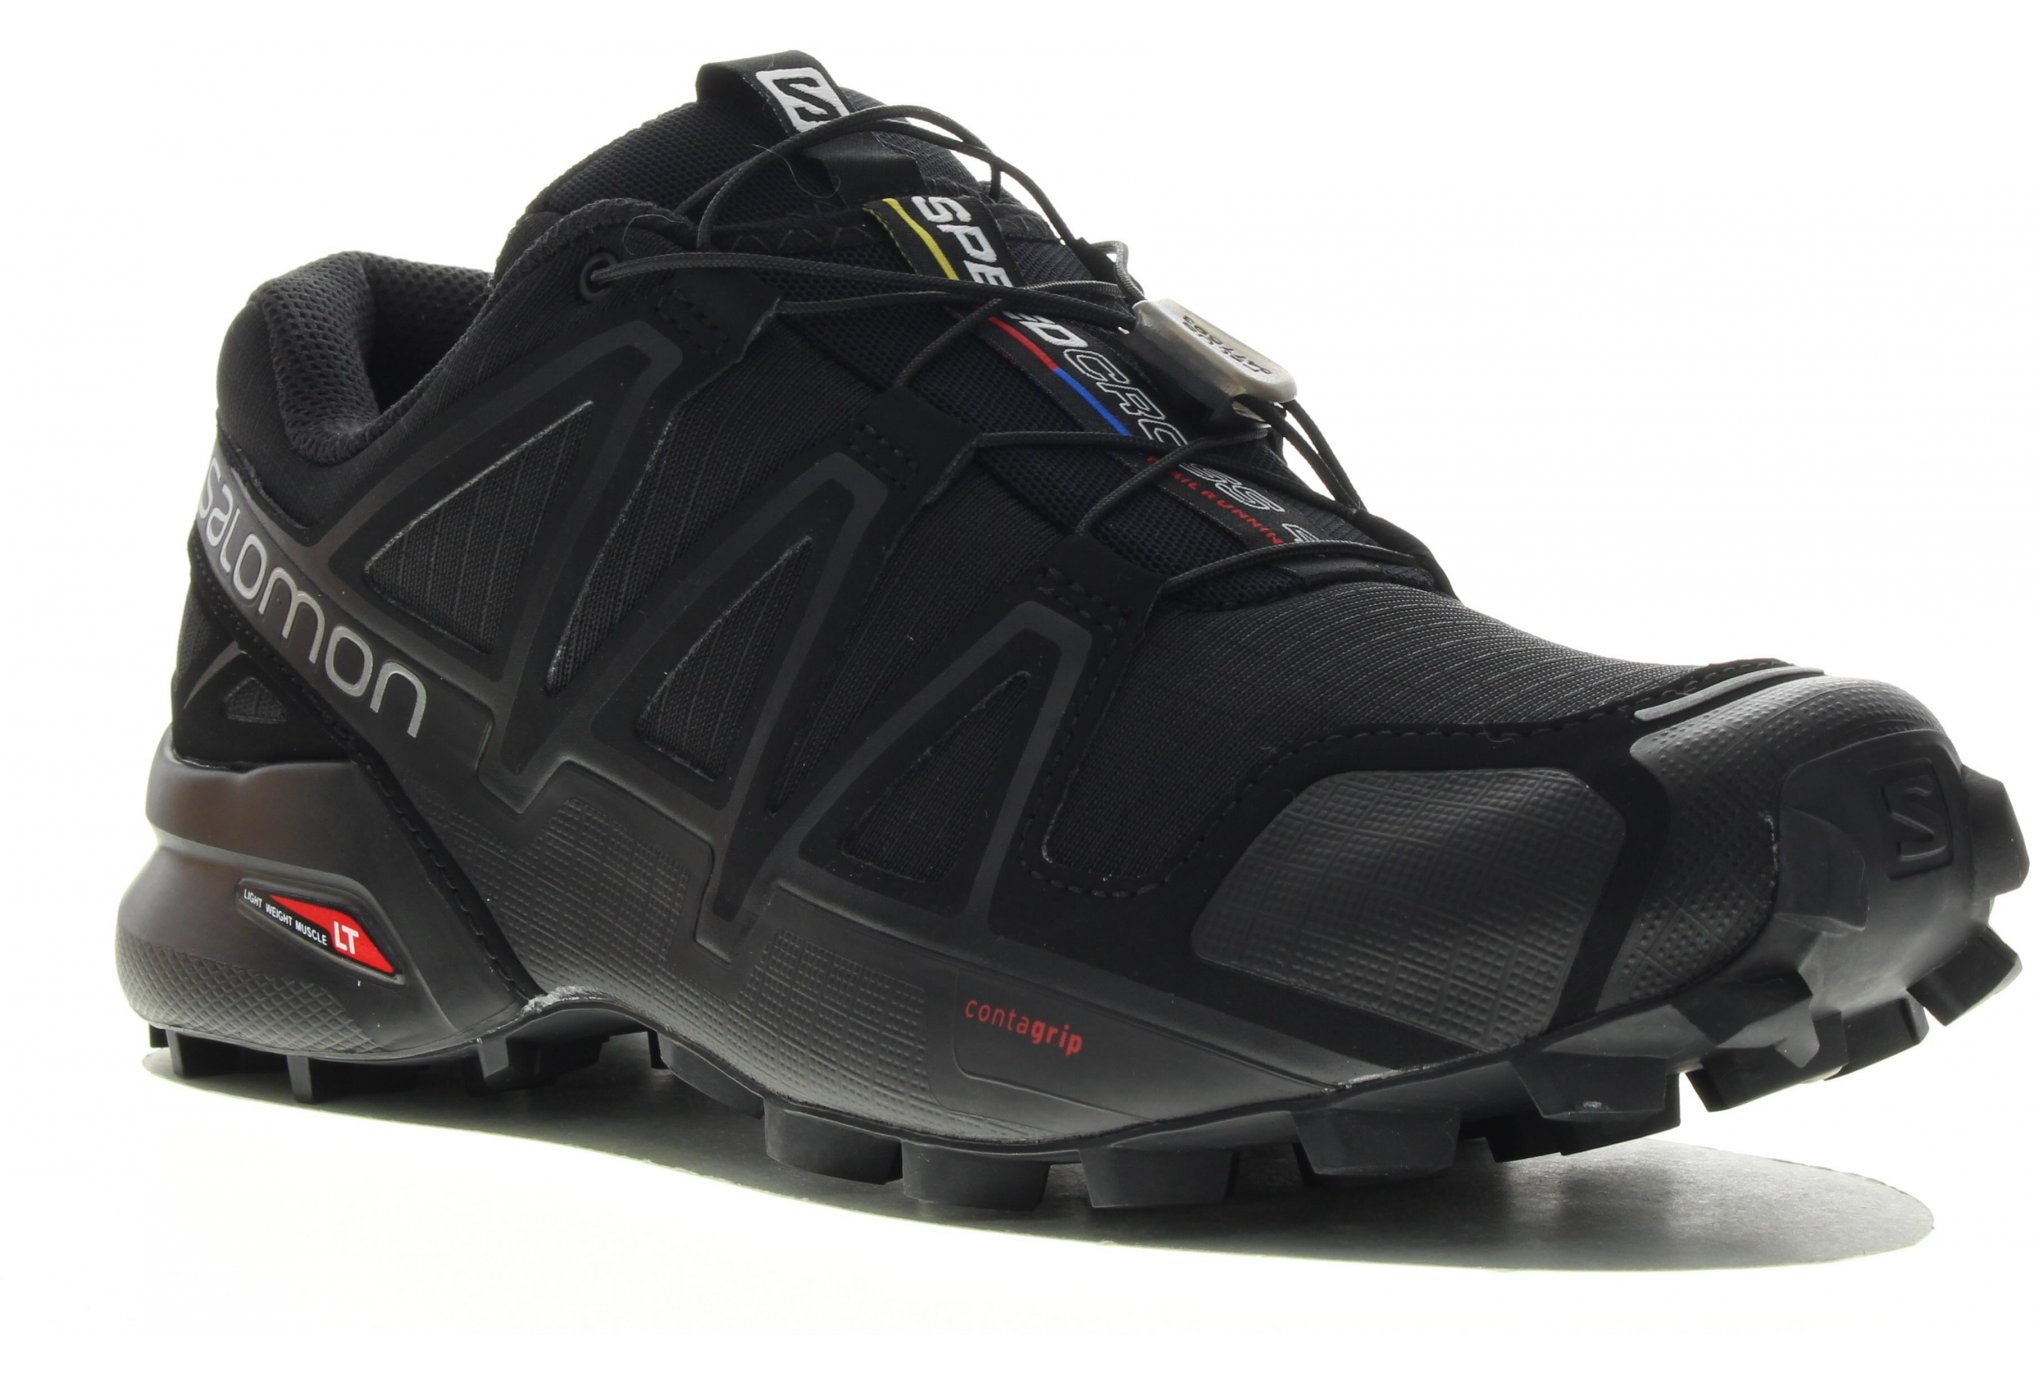 newest 6974b 4b148 Salomon Speedcross 4 M homme Kaki pas cher